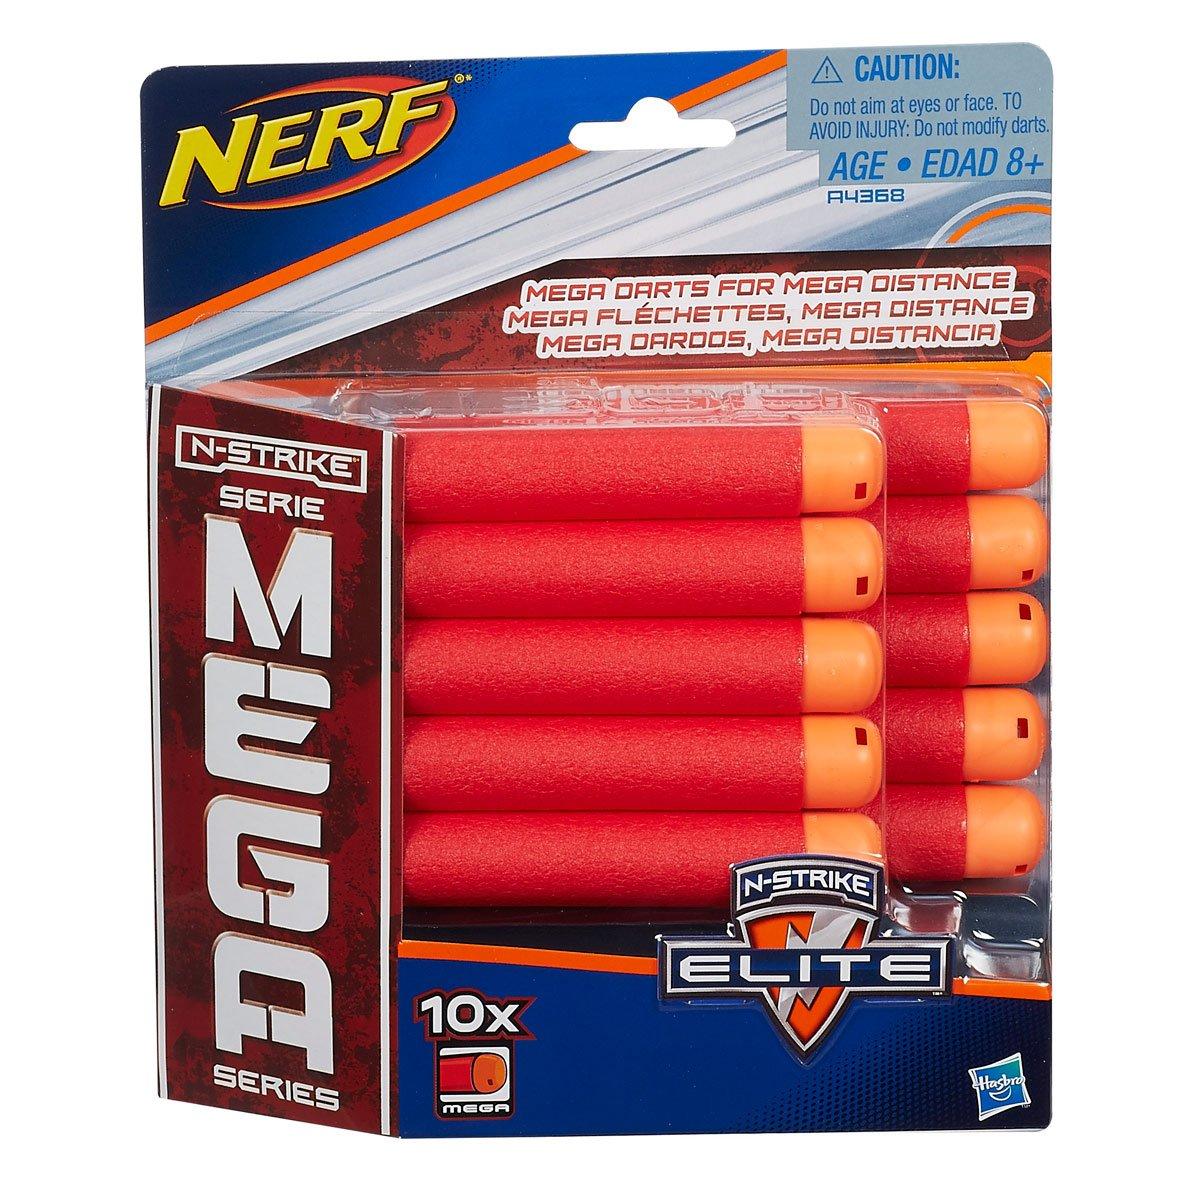 Nerf Dardos Mega Pack Hasbro